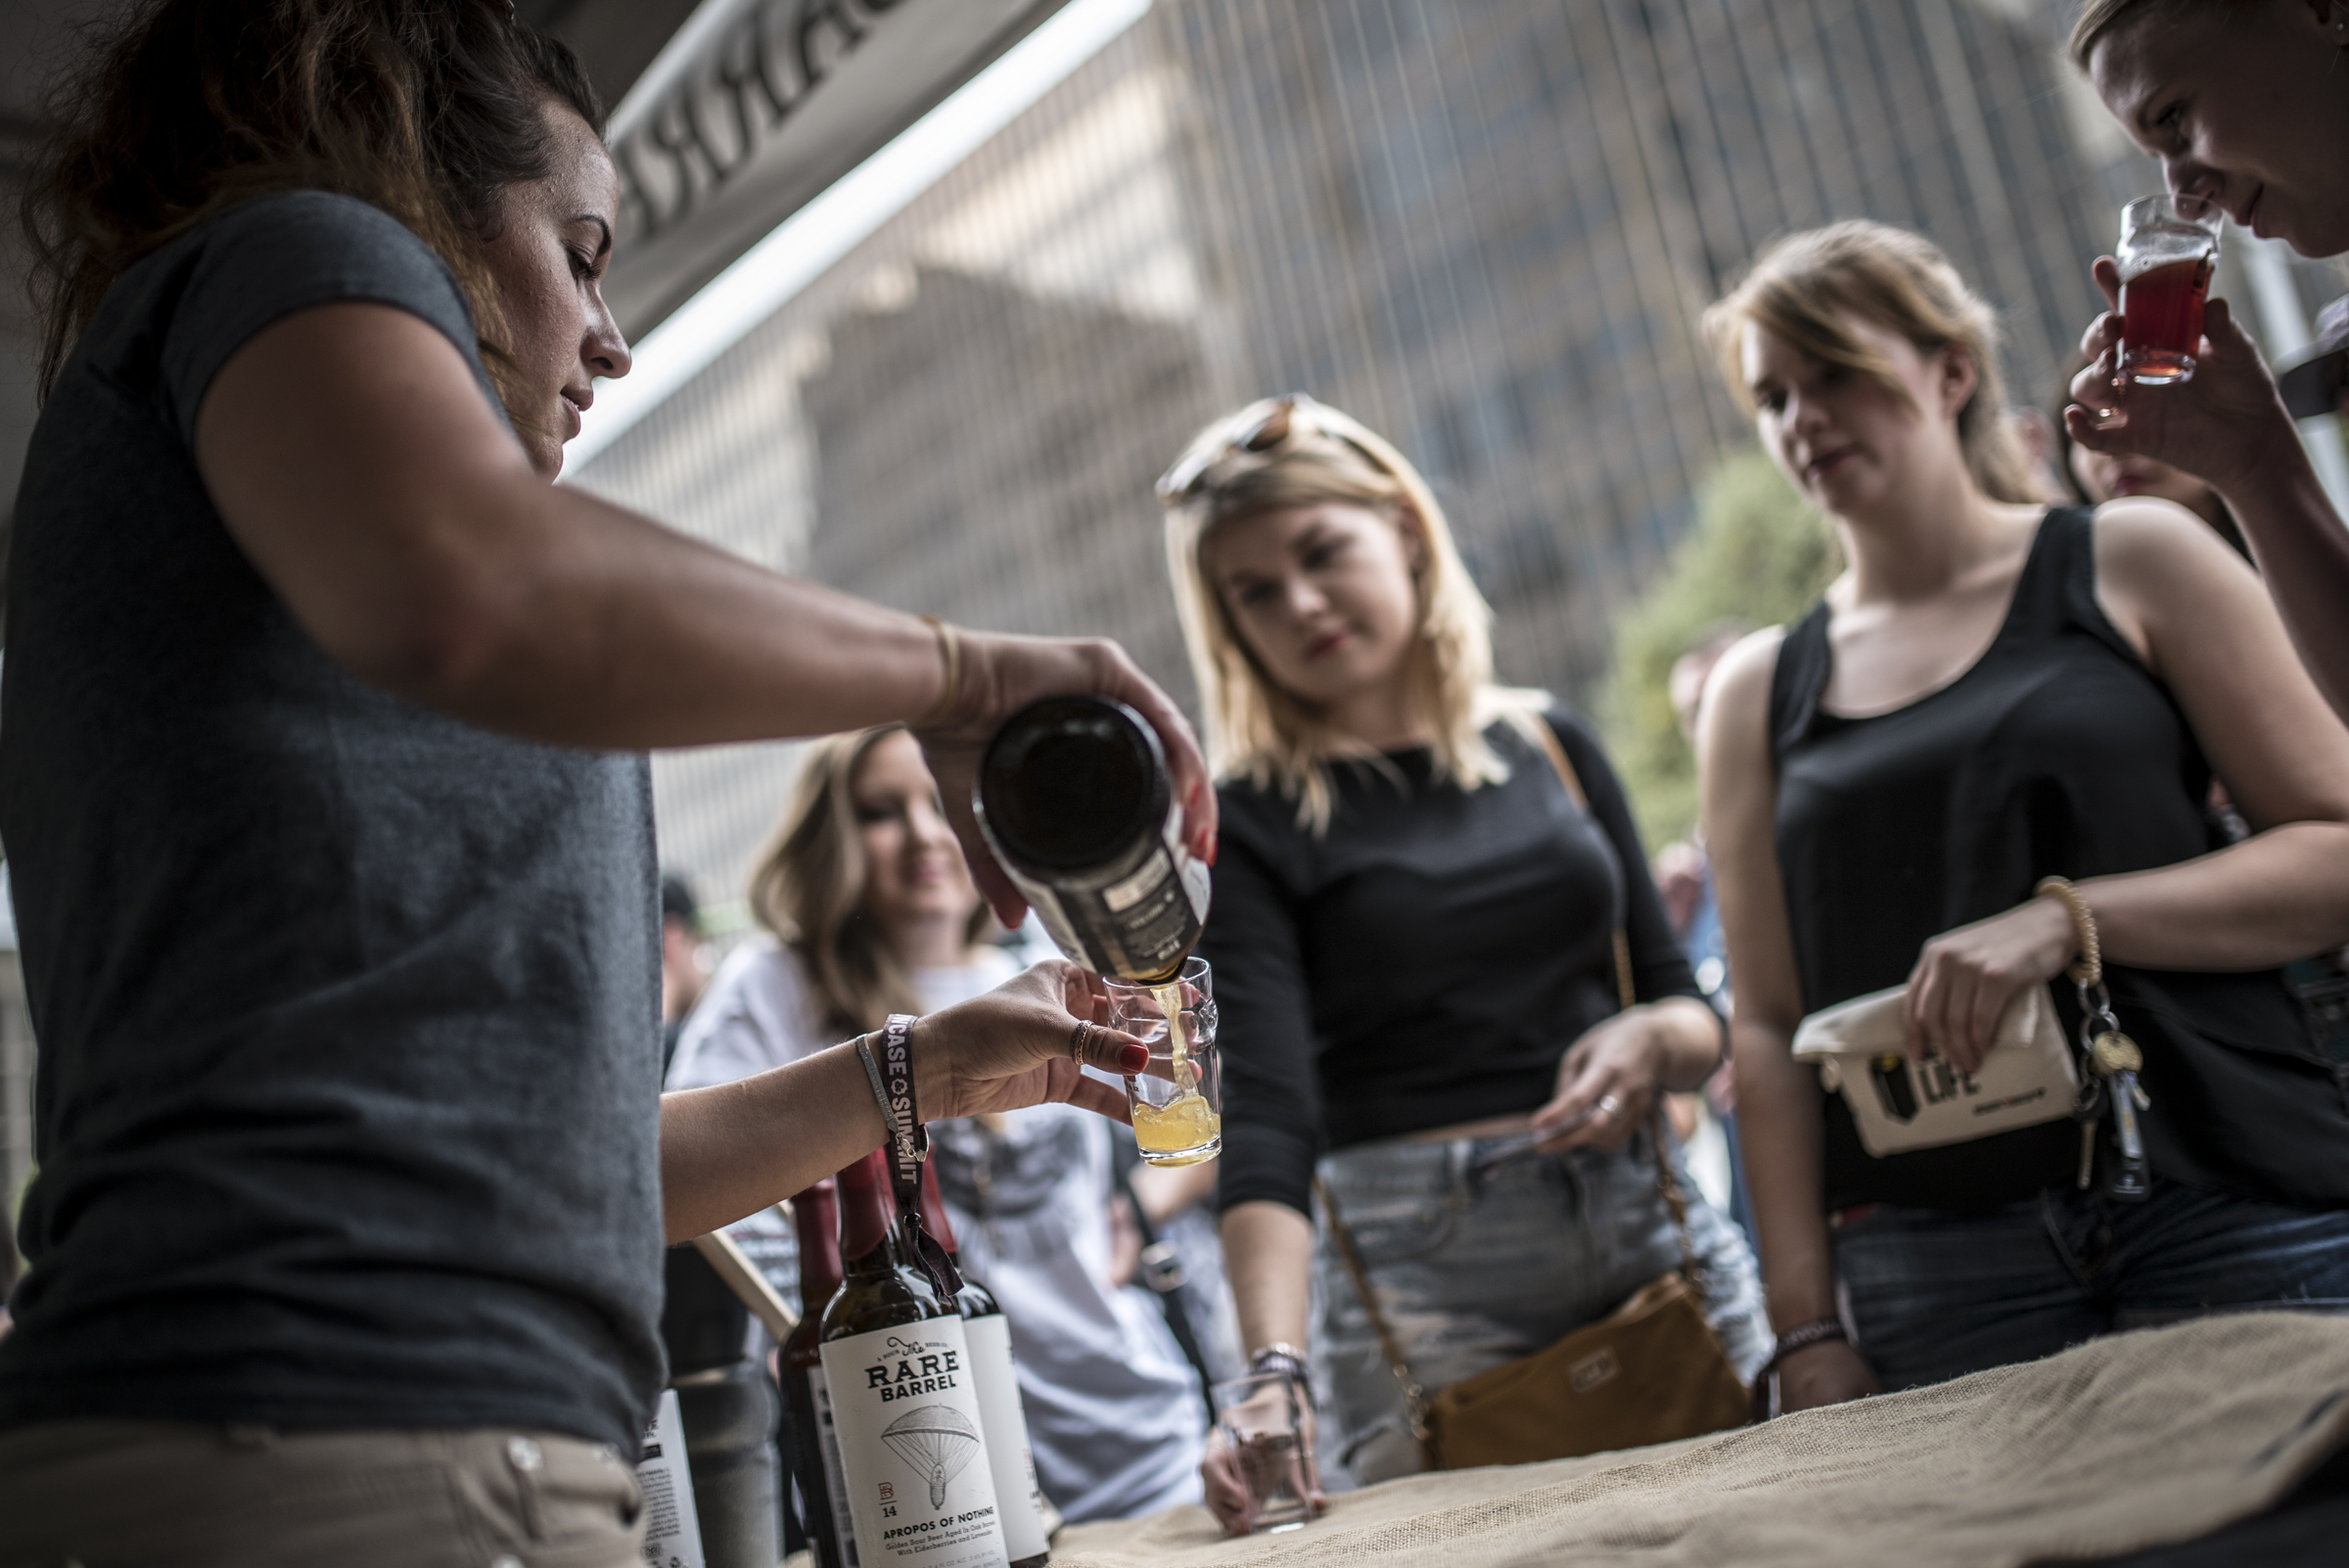 Big Beer's Buying Binge: An Insider's Perspective on the Craft Beer Industry